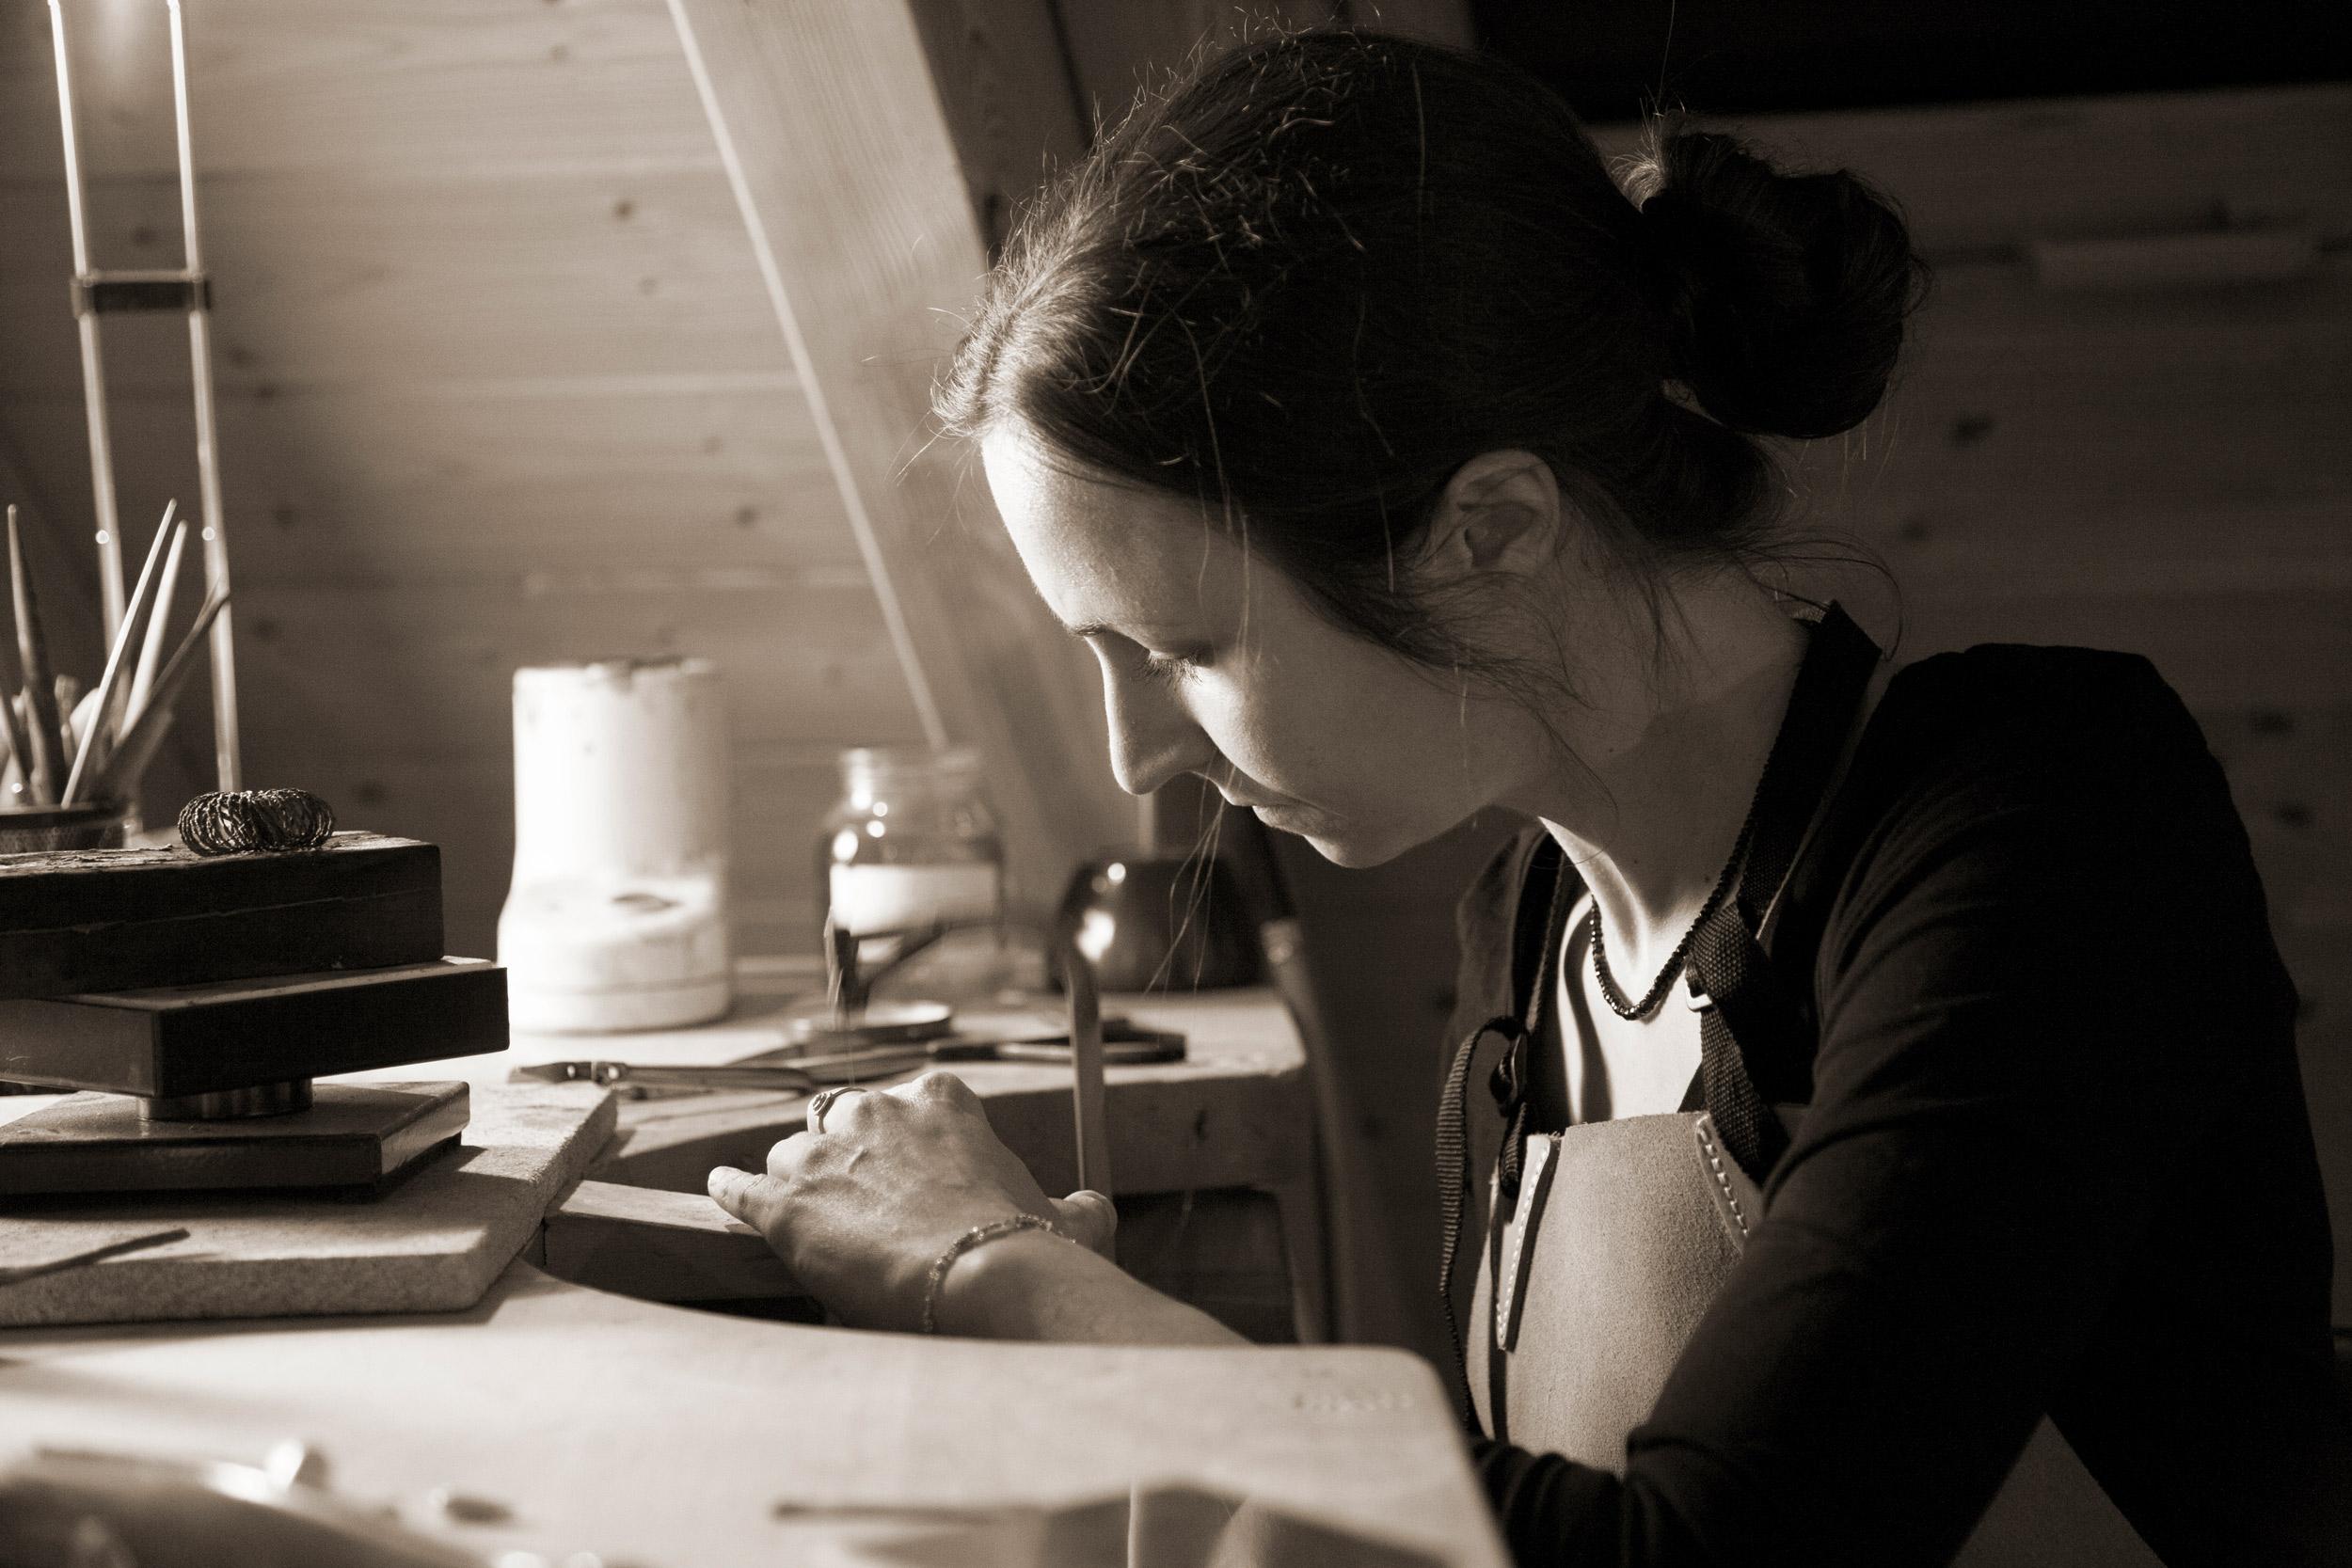 professionelle Handwerkskunst | Kathrin Dunst Goldschmiedin